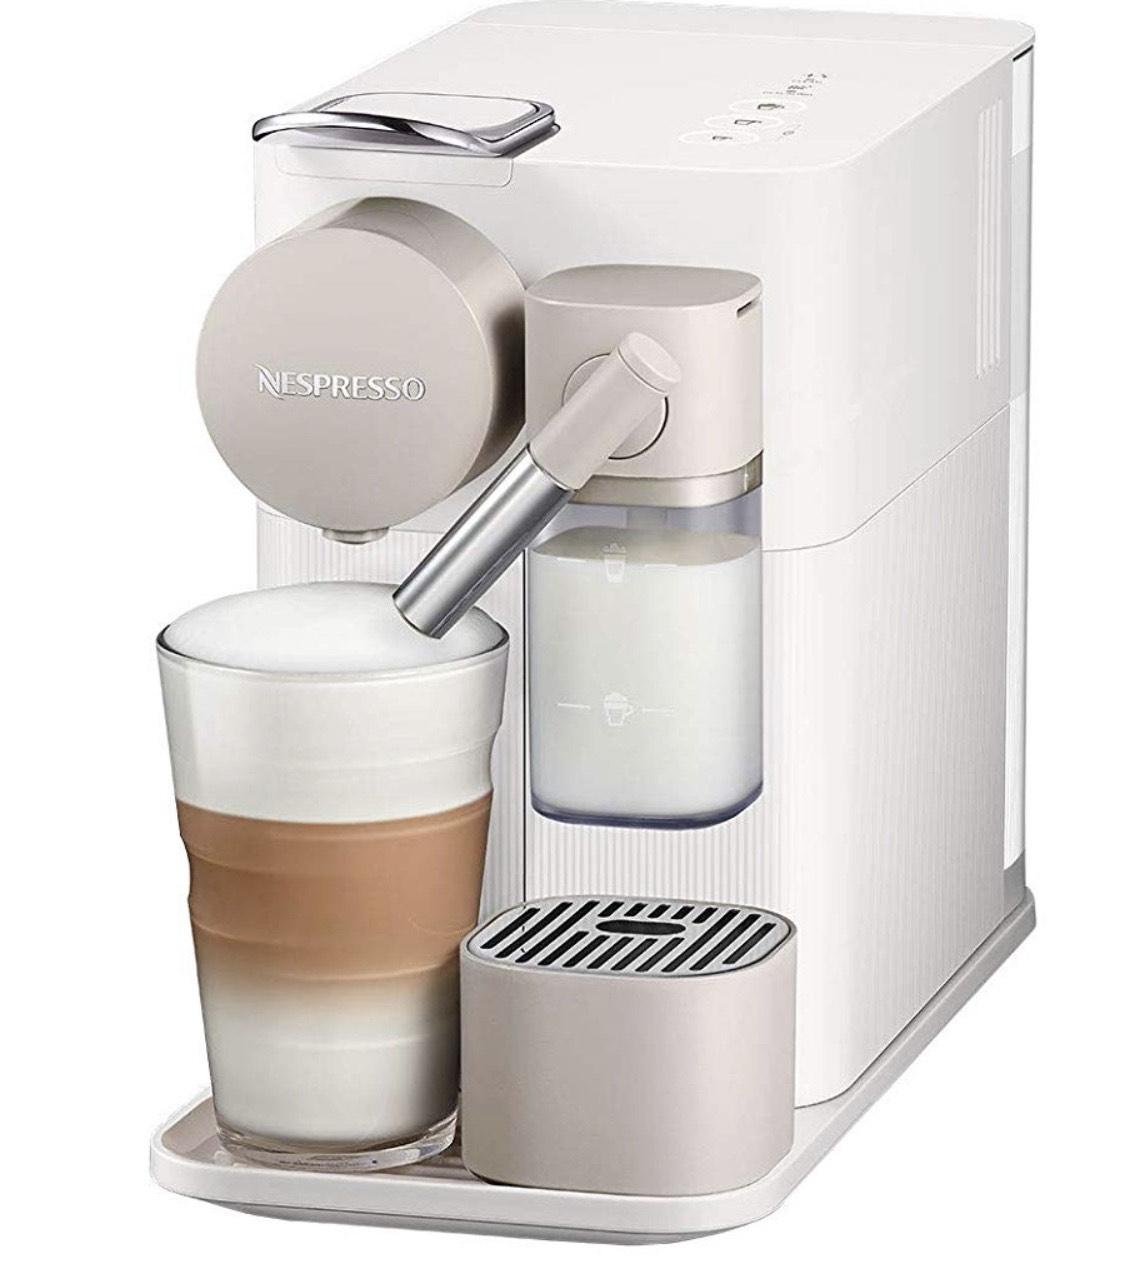 De'Longhi Nespresso EN 500.W Kaffeemaschine + 80€ Gutschein